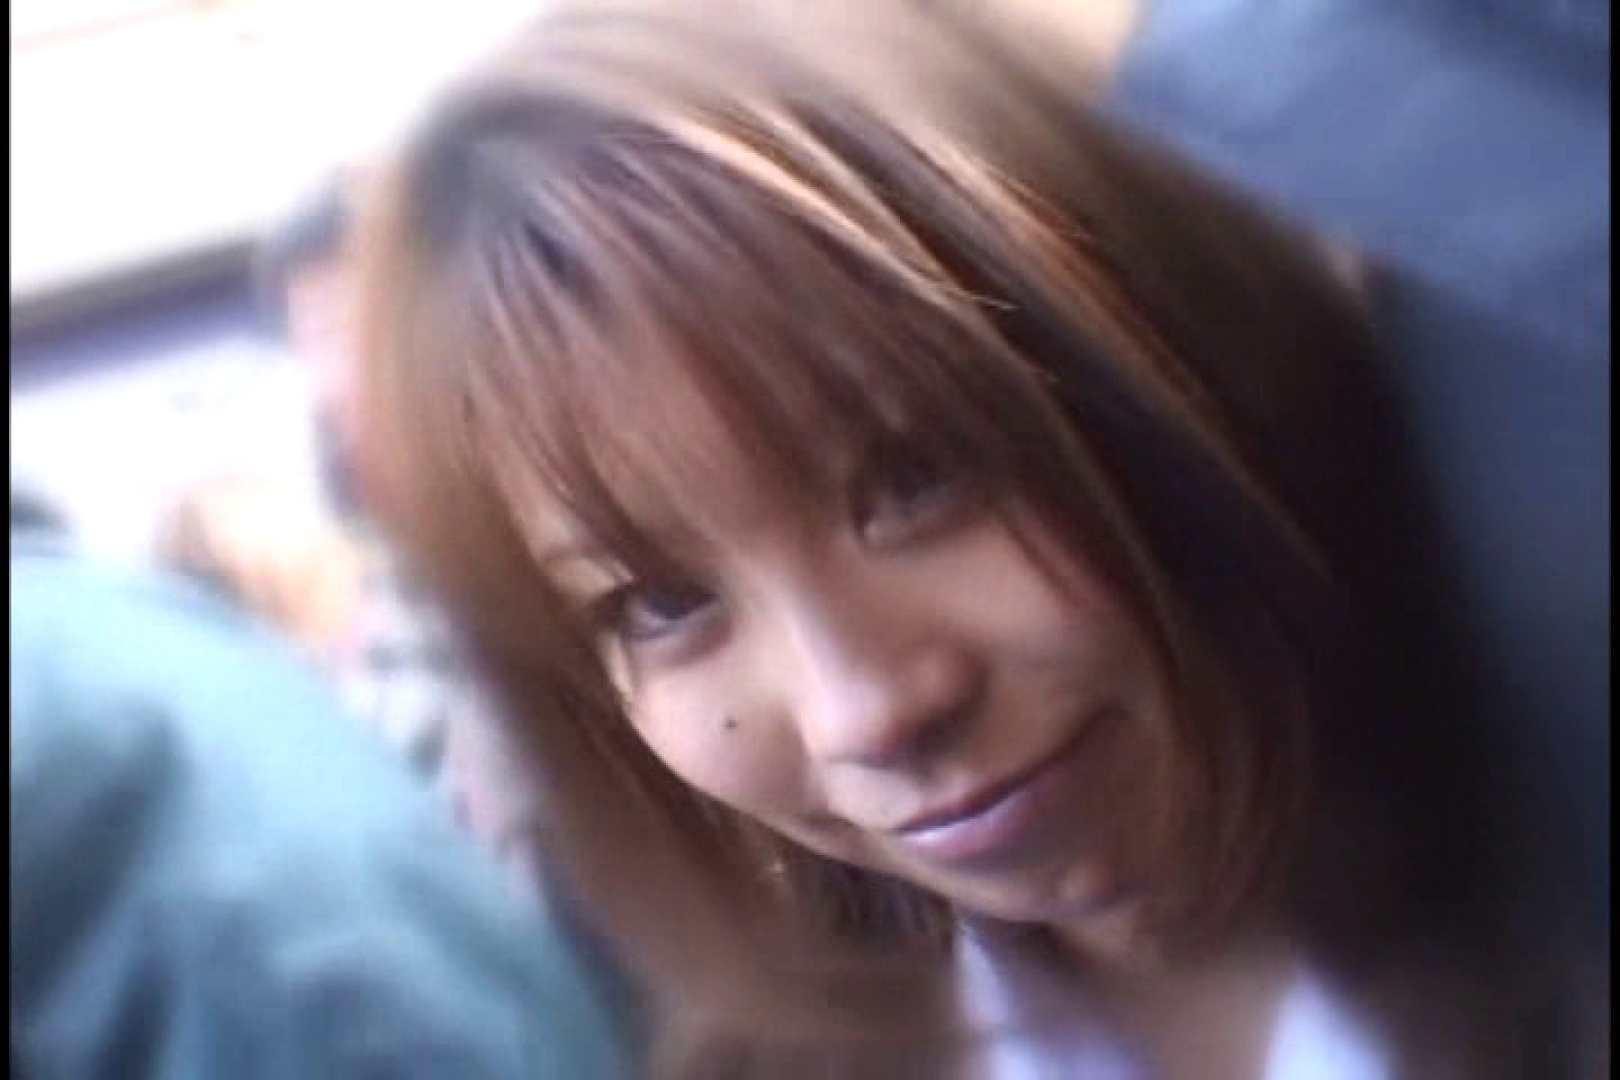 JDハンター全国ツアー vol.014 前編 女子大生のエロ動画 | 0  104PIX 5